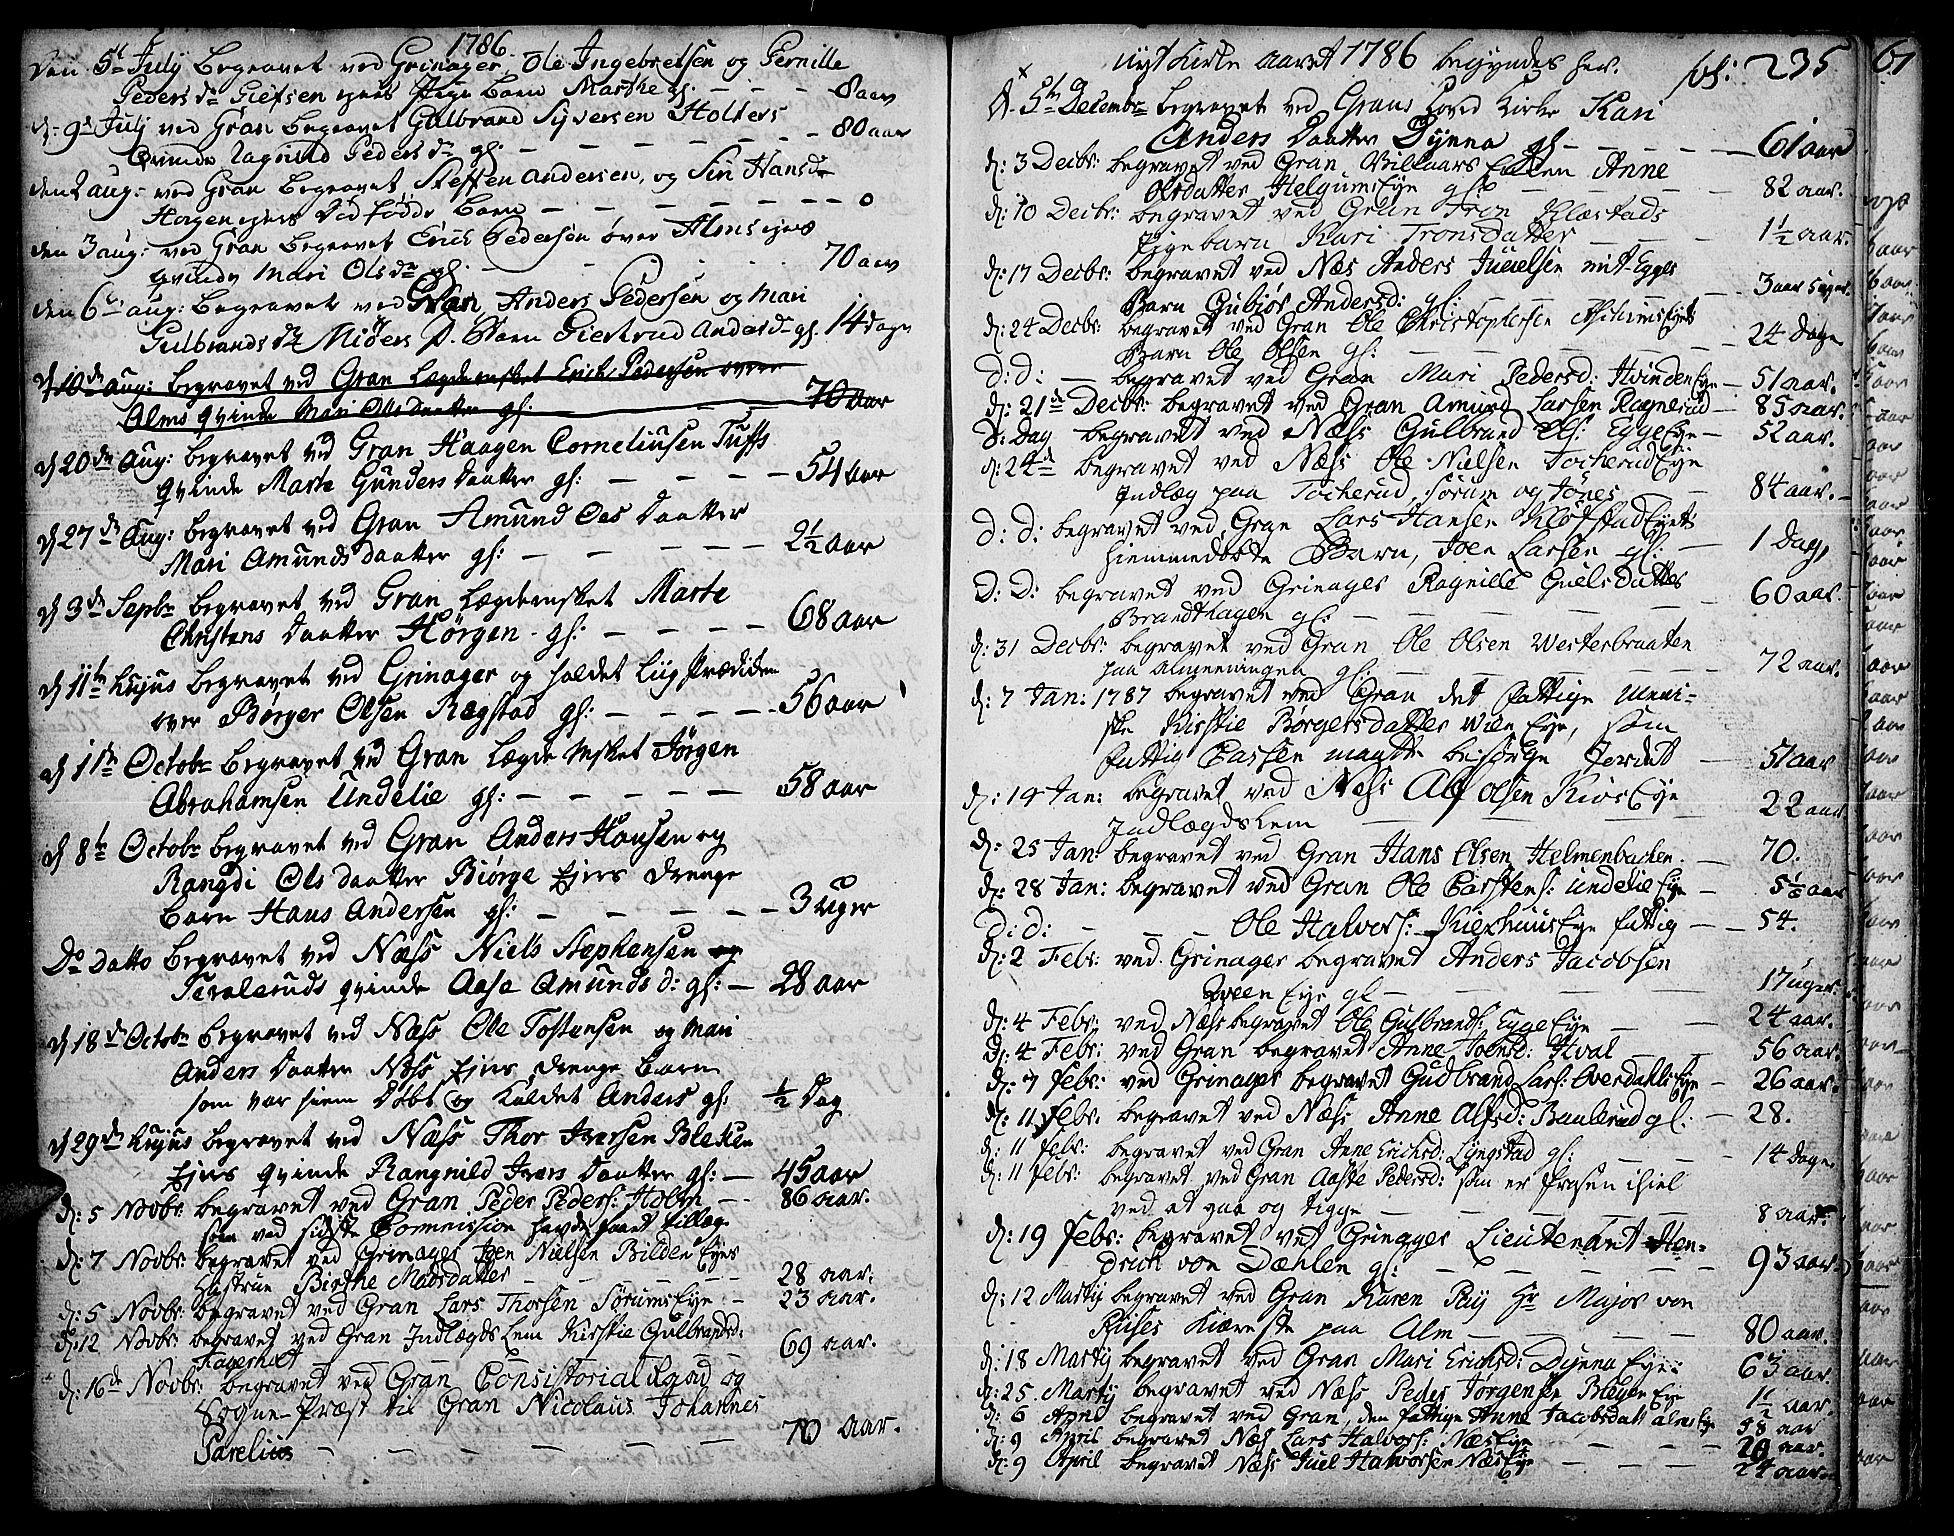 SAH, Gran prestekontor, Ministerialbok nr. 5, 1776-1788, s. 235